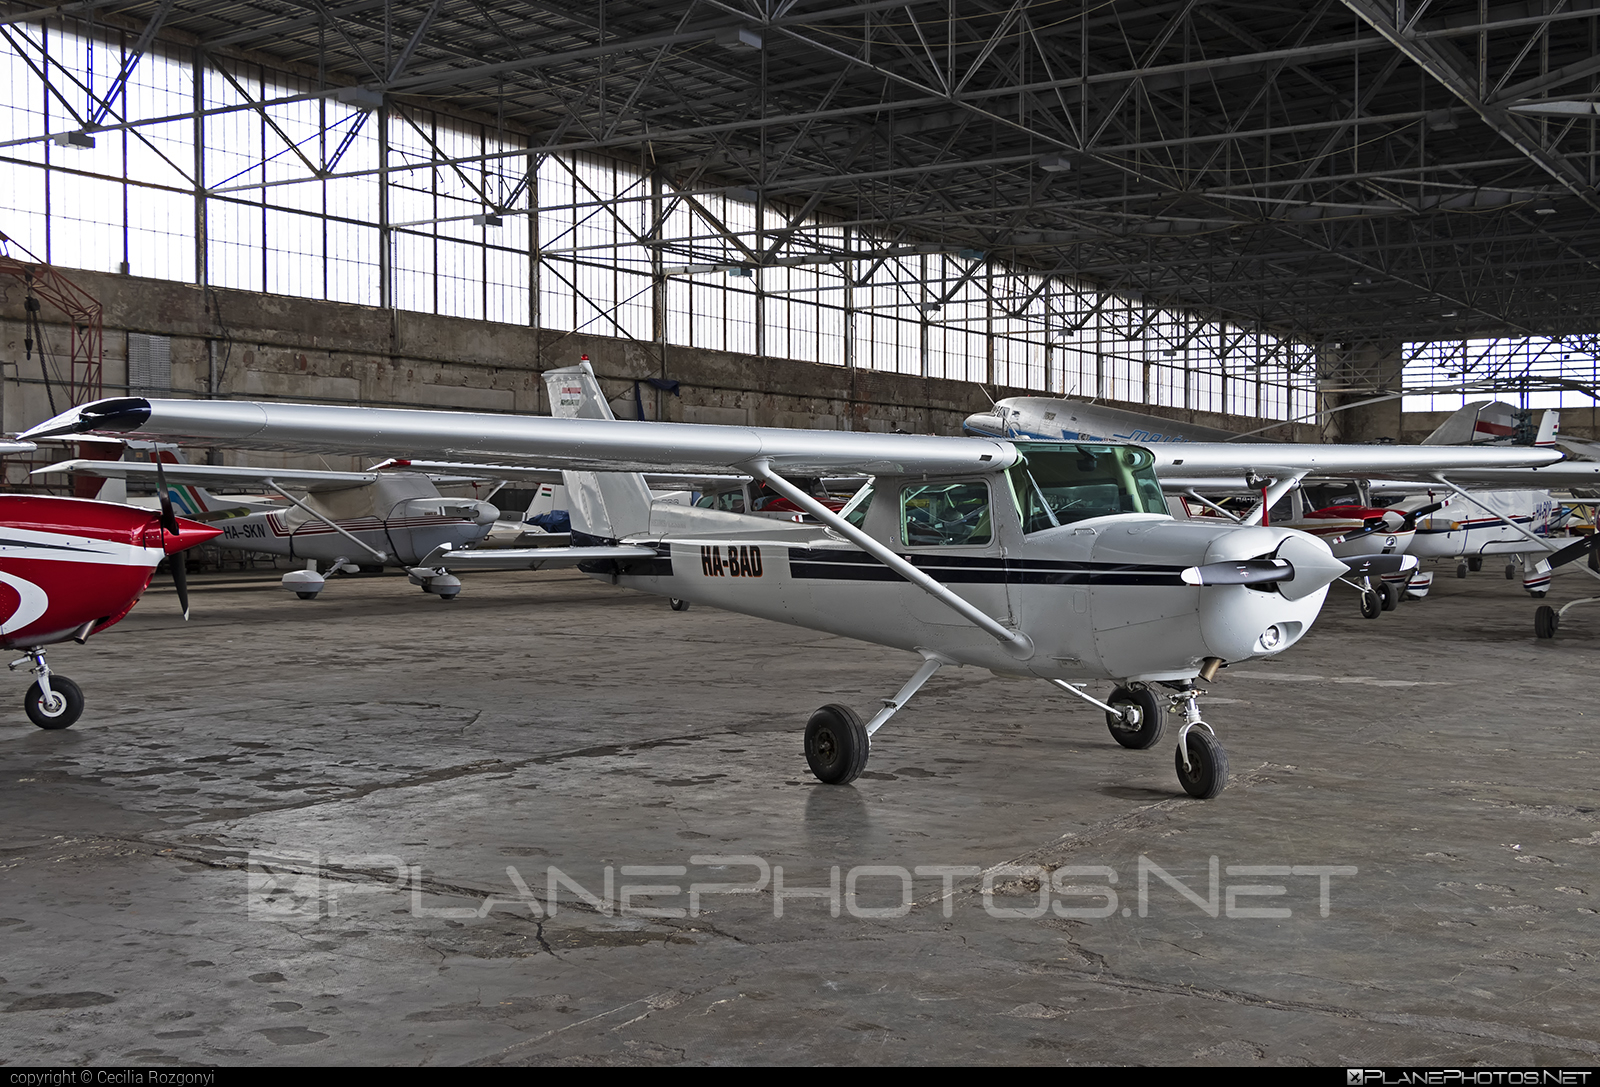 Reims FA152 Aerobat - HA-BAD operated by Private operator #cessna152 #cessna152aerobat #cessnaa152aerobat #reims #reimsfa152 #reimsfa152aerobat